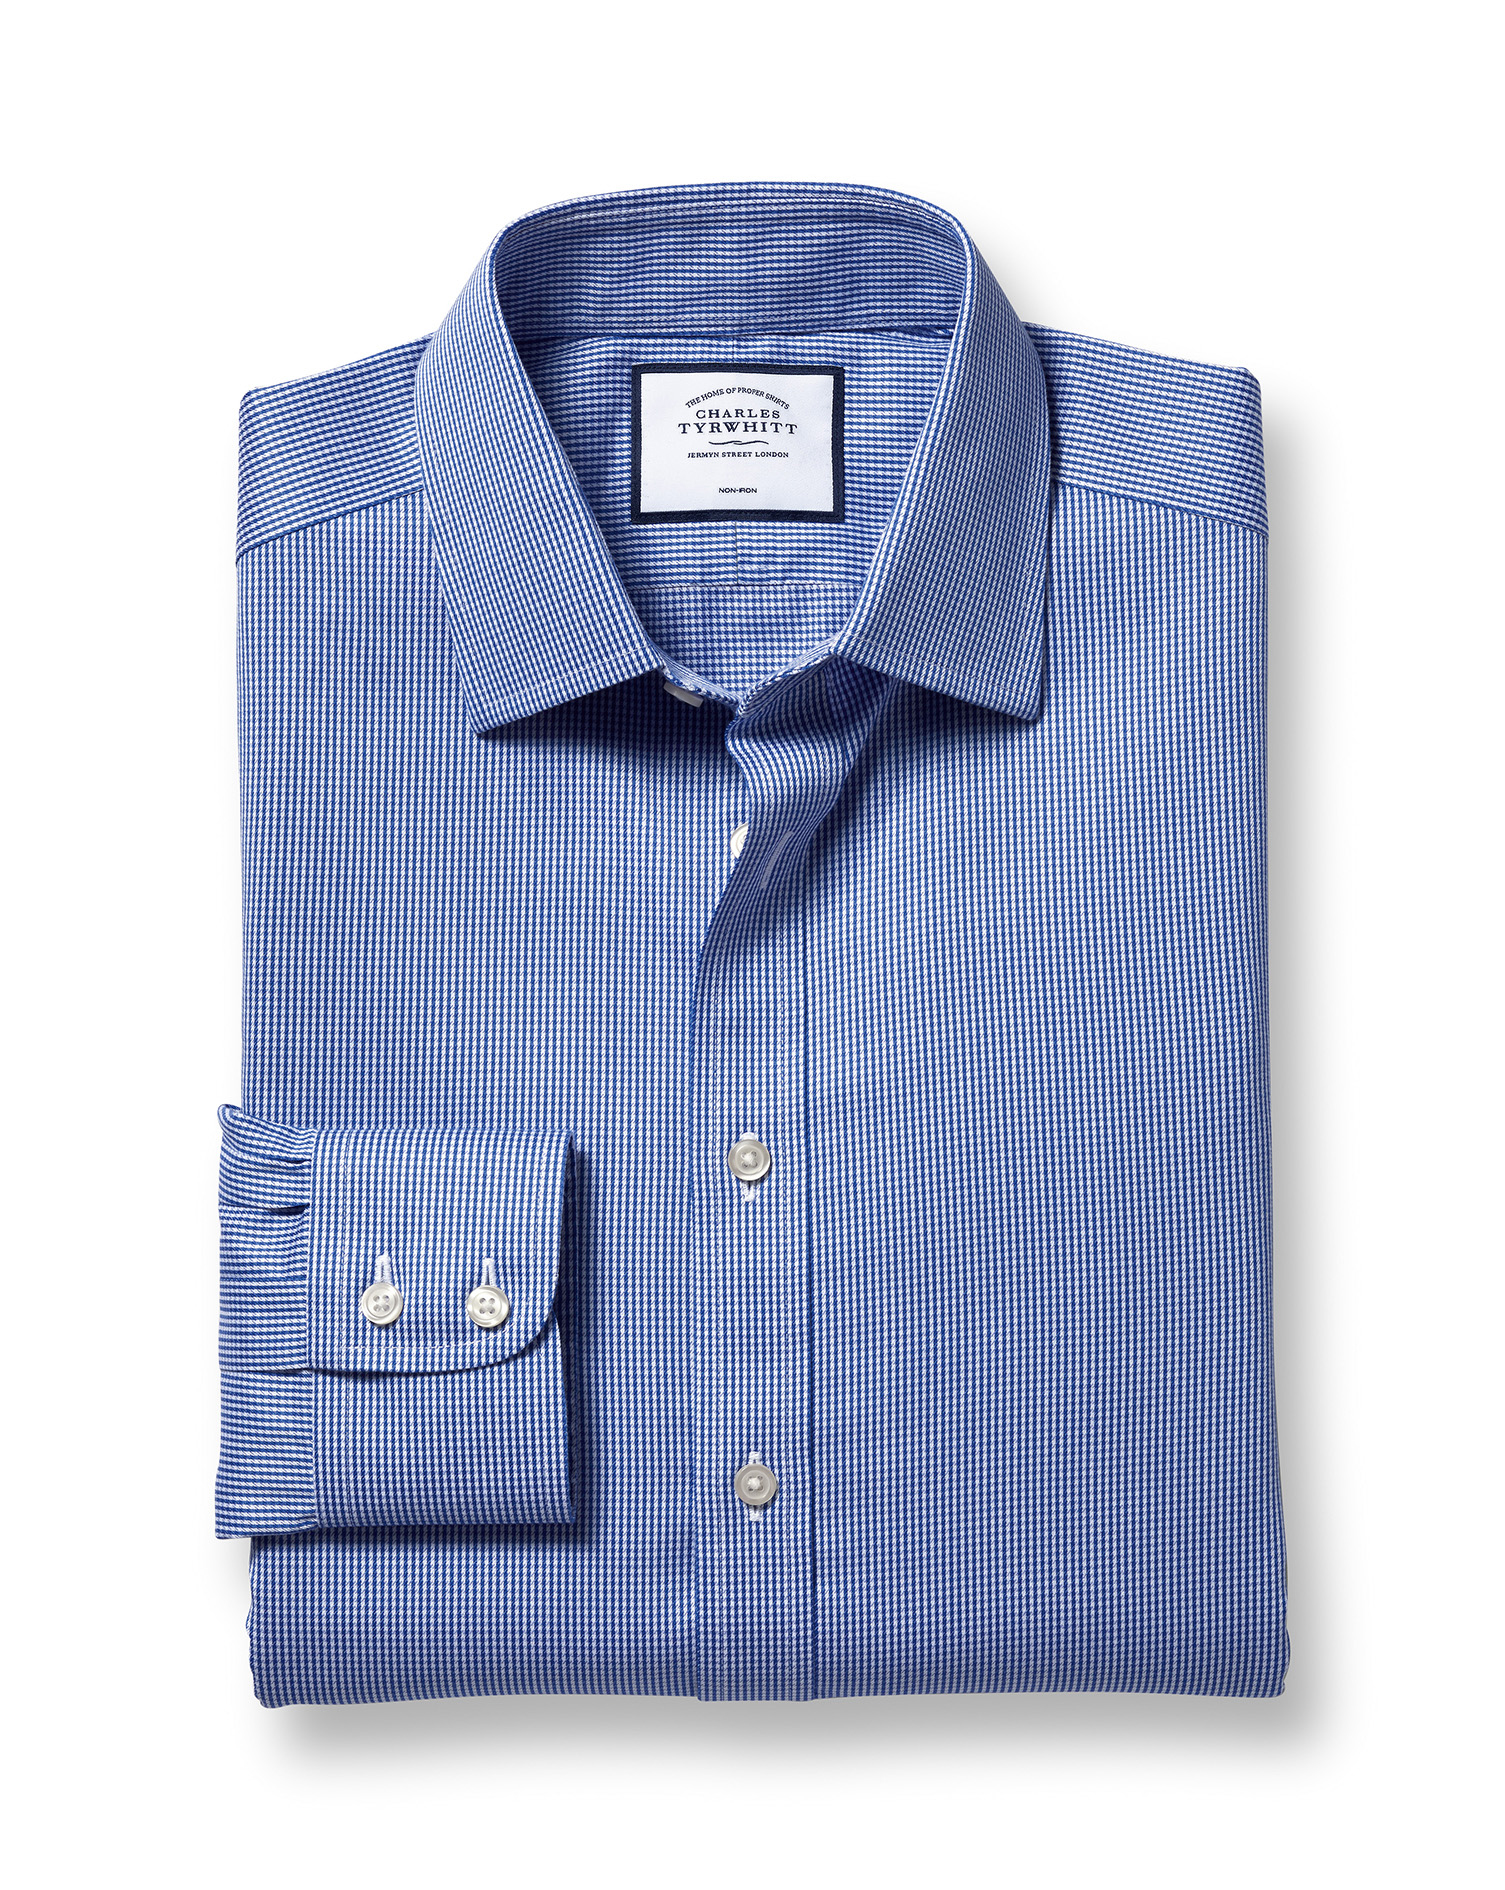 Cotton Slim Fit Non-Iron Royal Blue Puppytooth Shirt